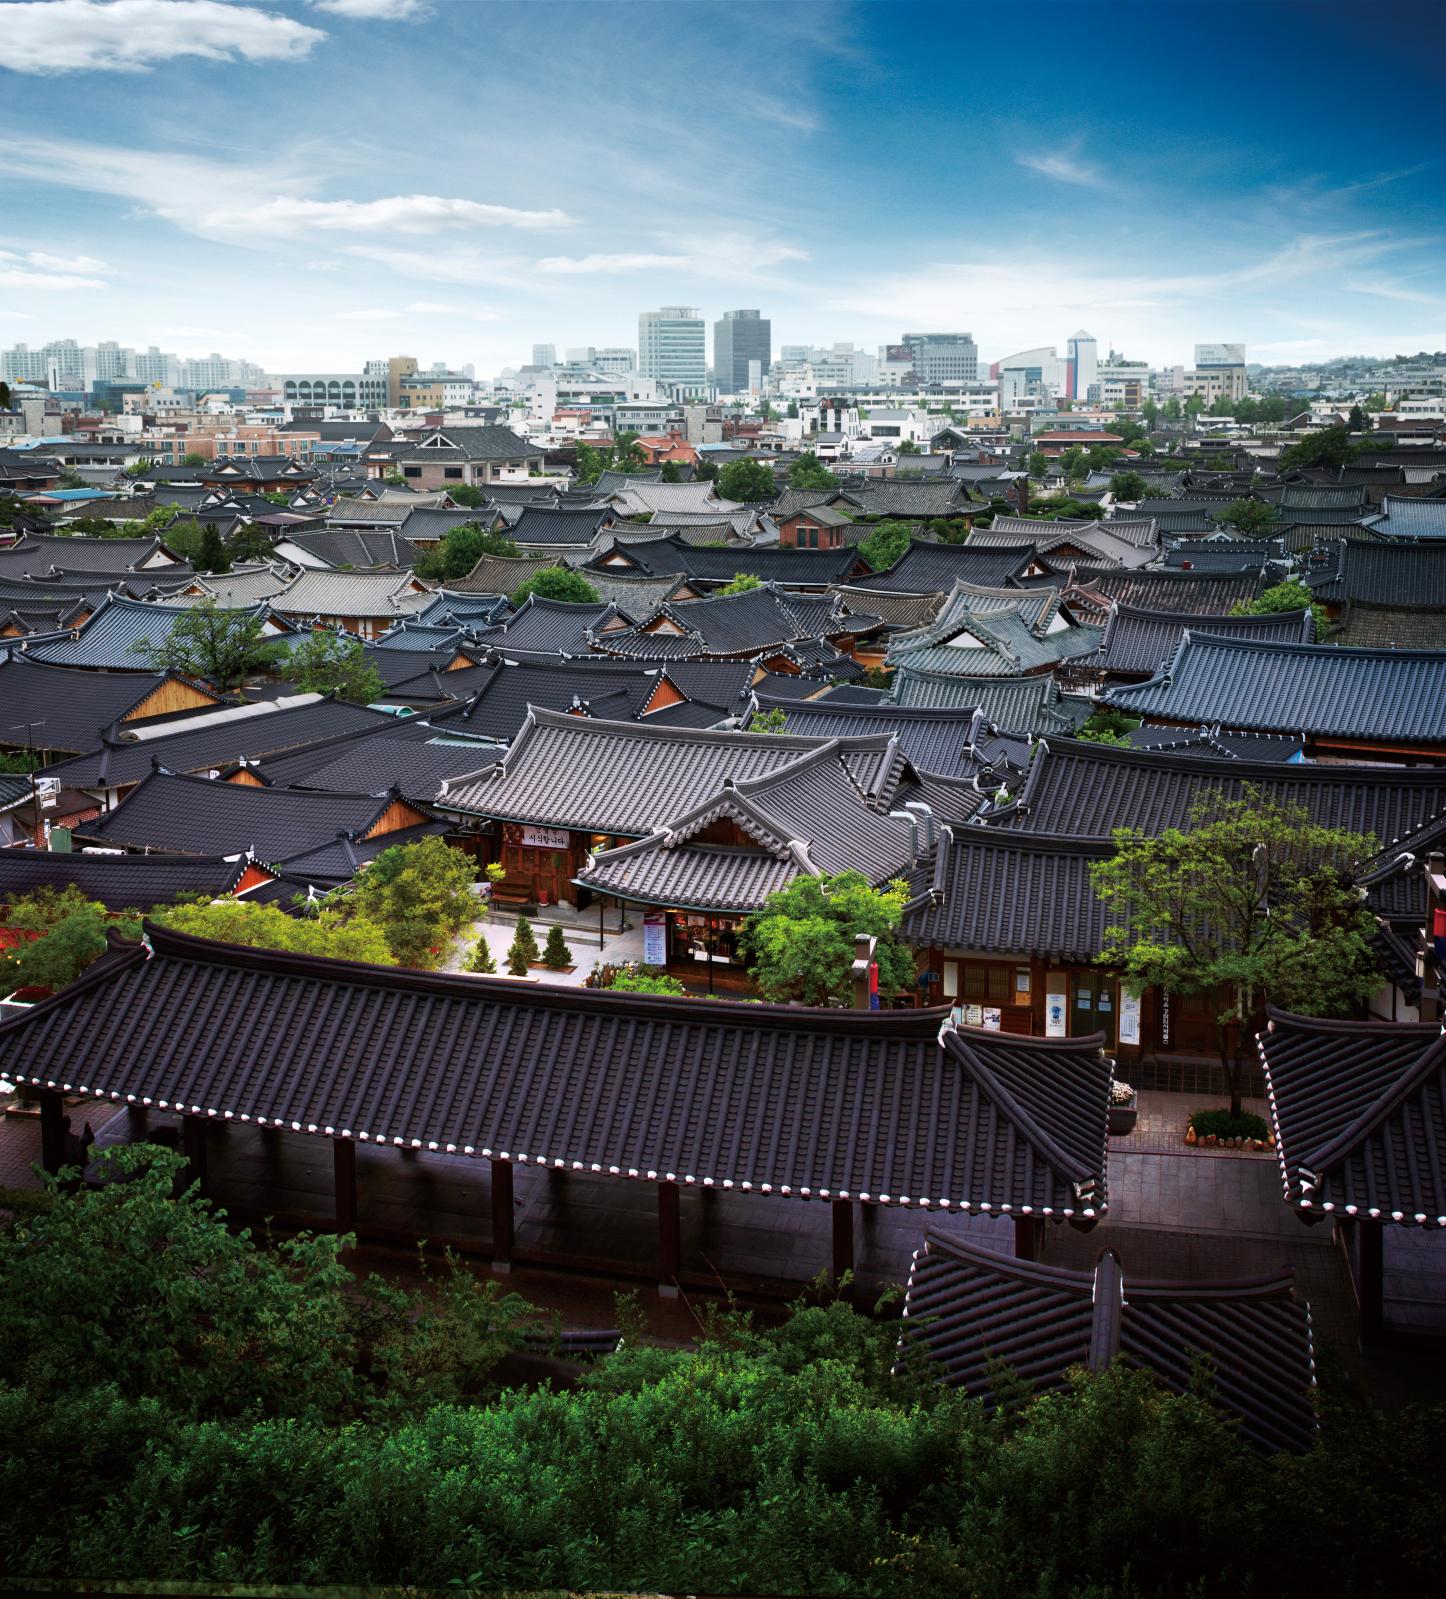 Image from Visit Korea